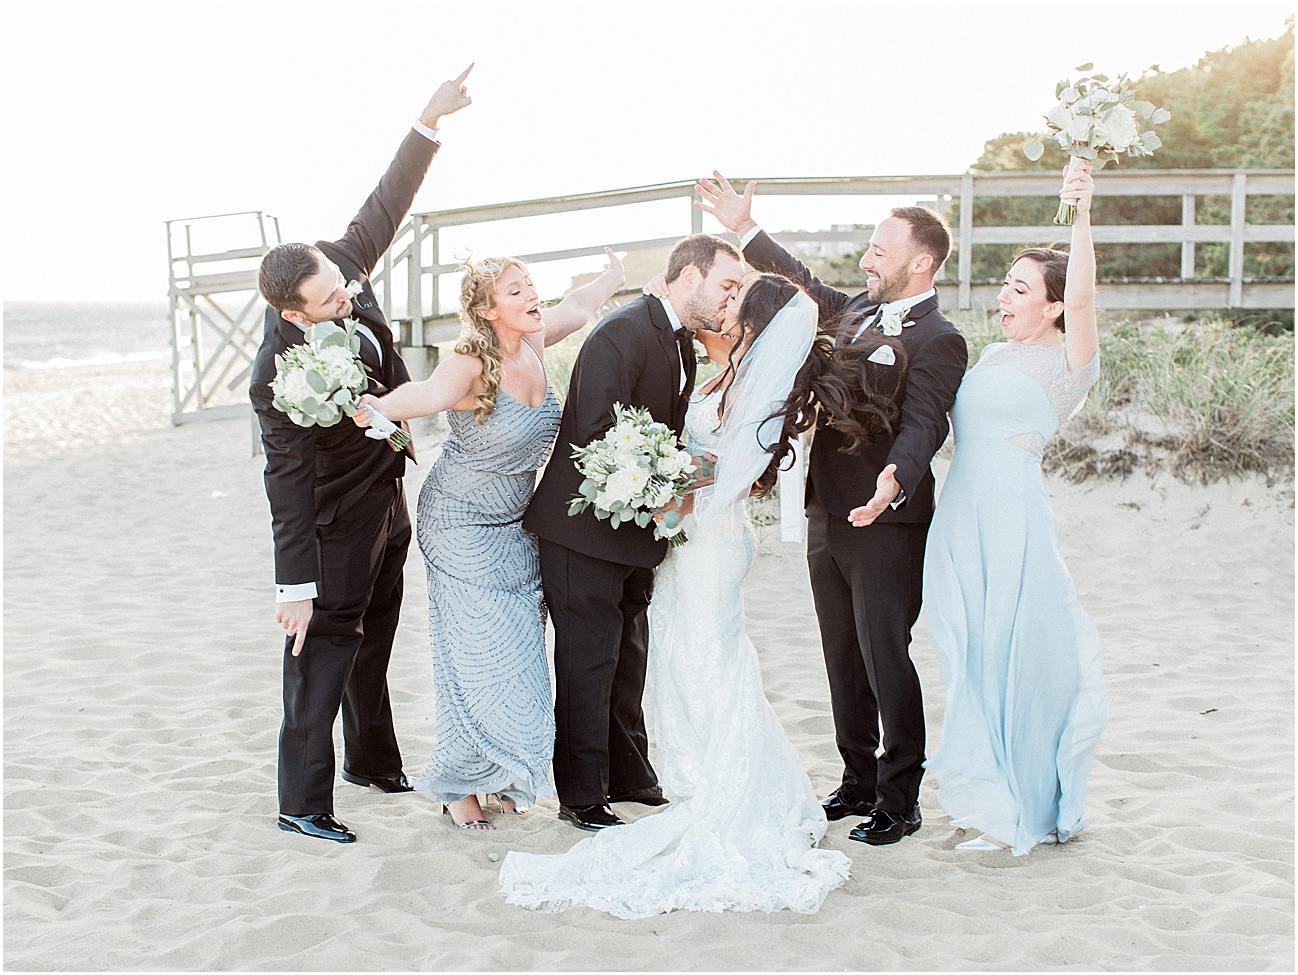 michelle_matt_popponesset_inn_celebrations_new_seabury_fall_cape_cod_boston_wedding_photographer_meredith_jane_photography_photo_1574.jpg